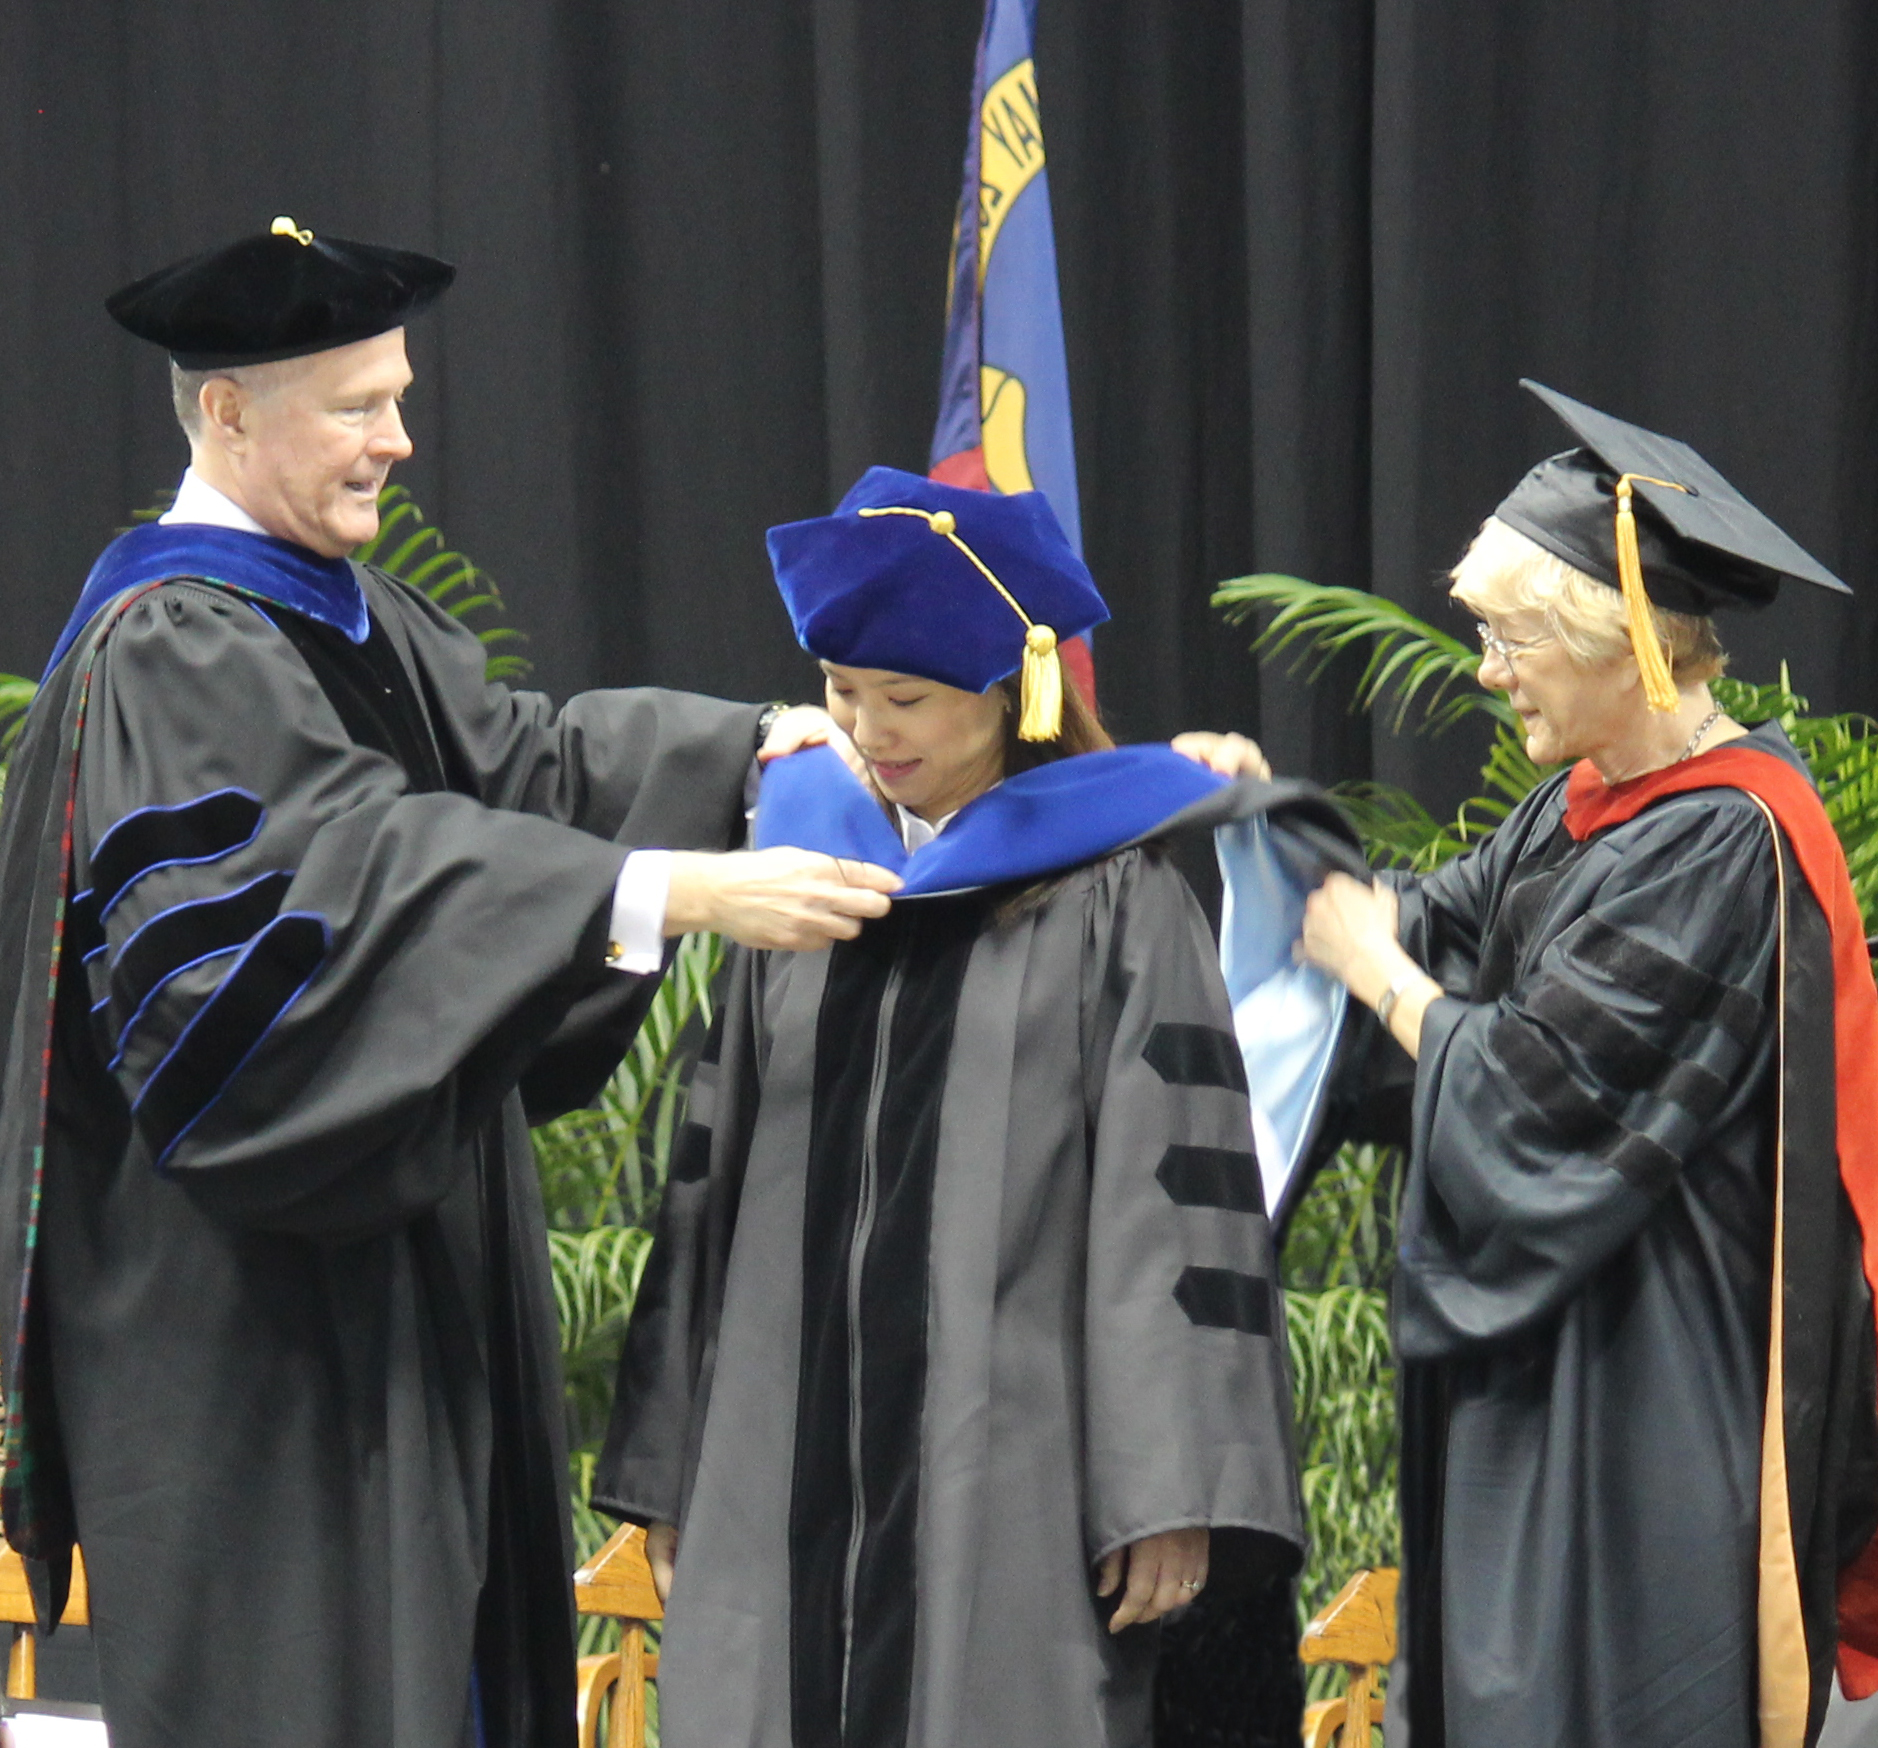 Graduation 2015:  the Hooding Ceremony